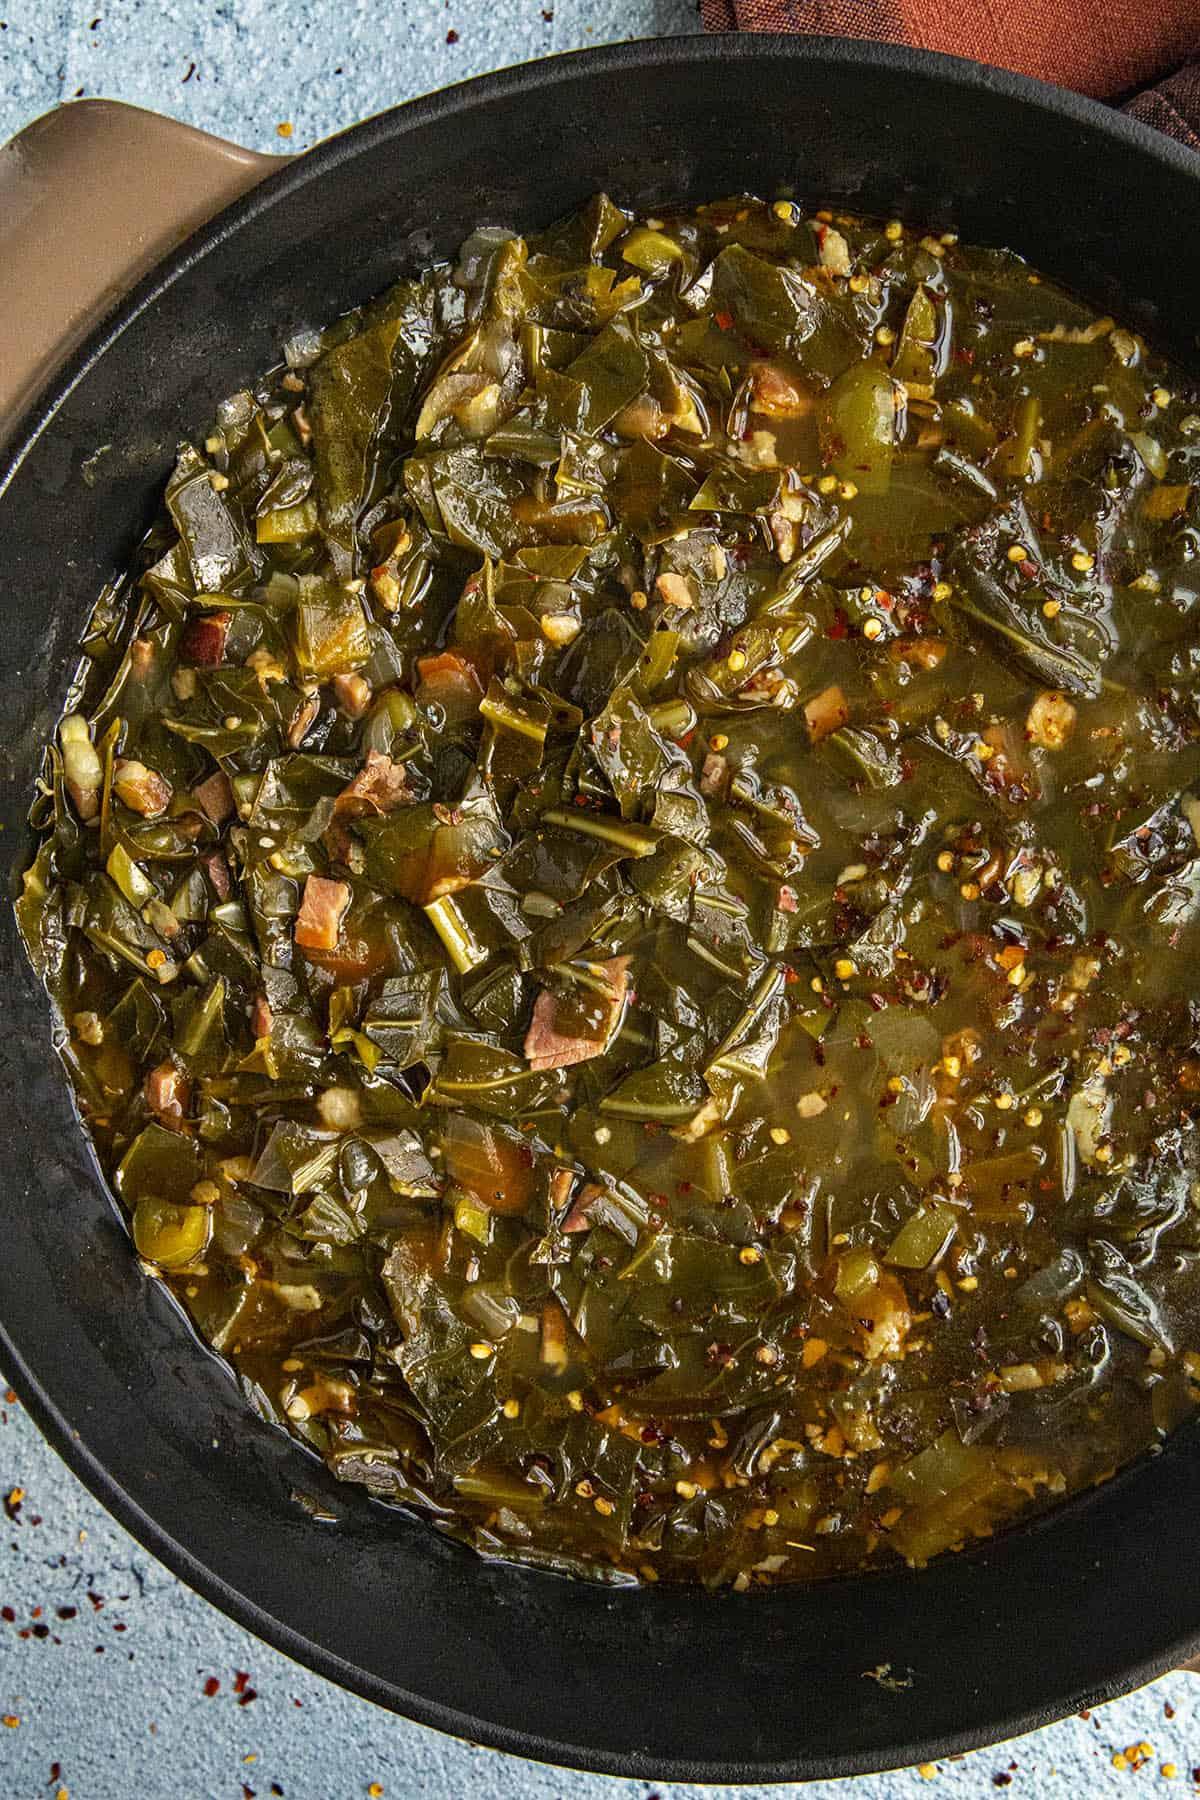 Collard Greens simmering in a pot